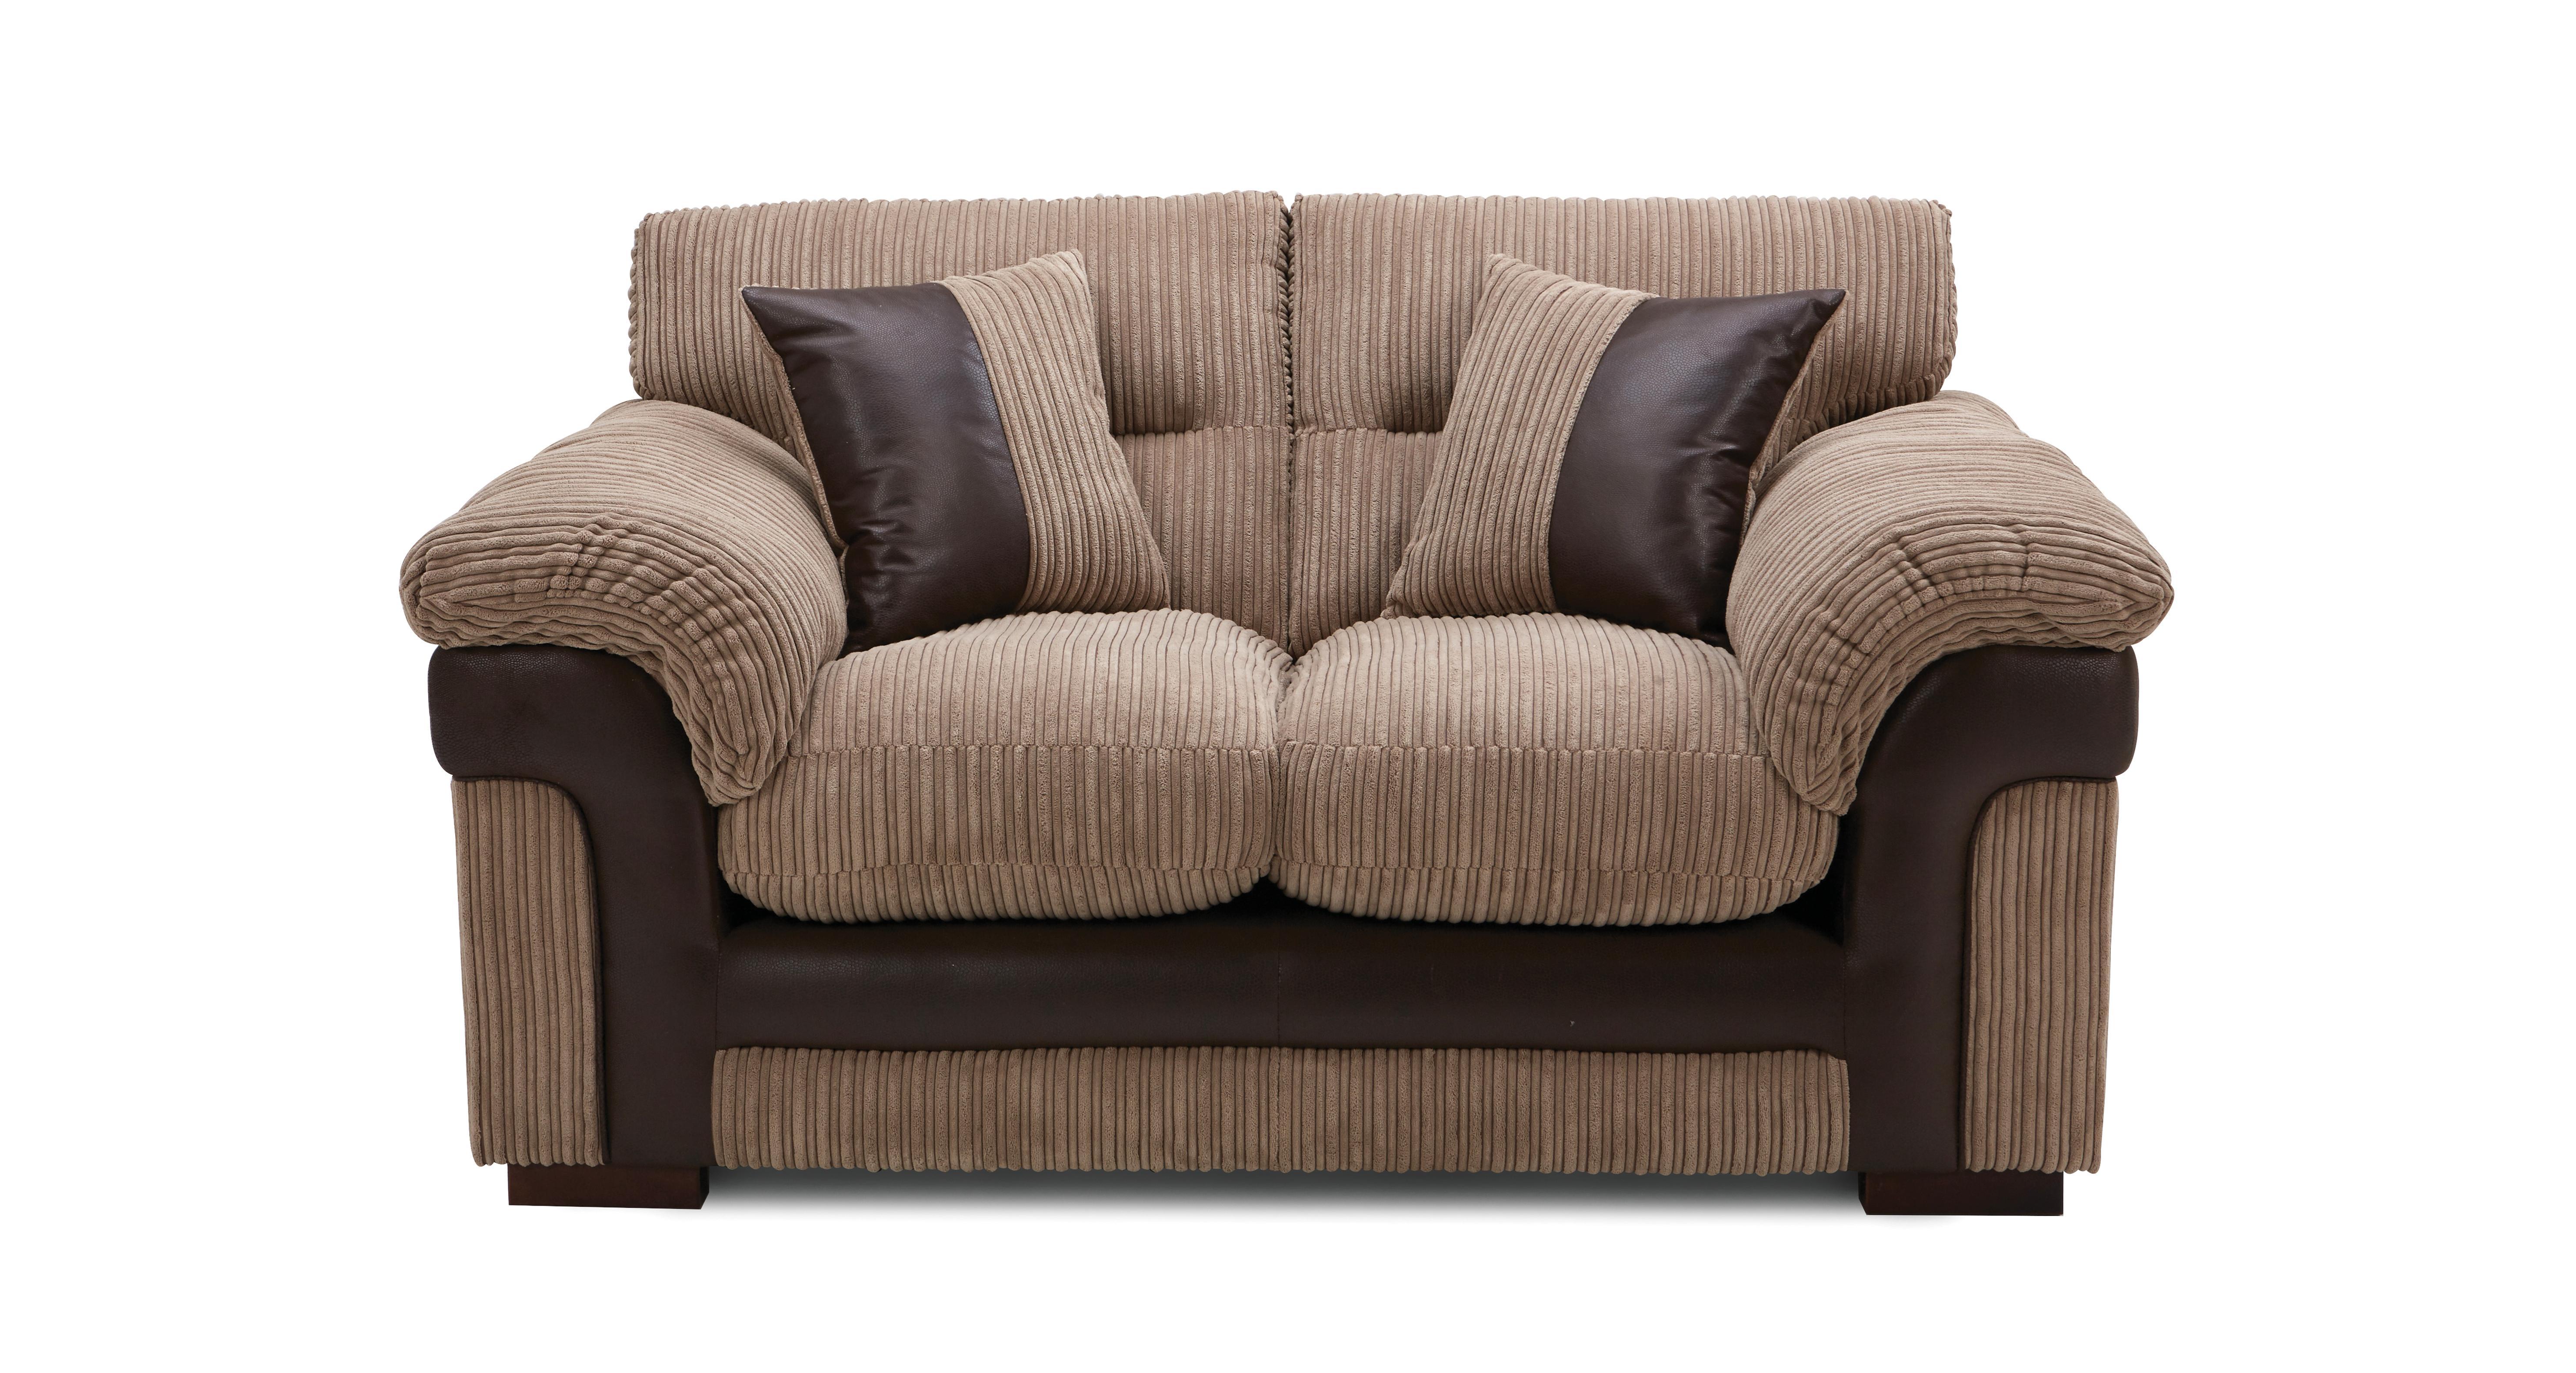 saxon sofa dfs. Black Bedroom Furniture Sets. Home Design Ideas